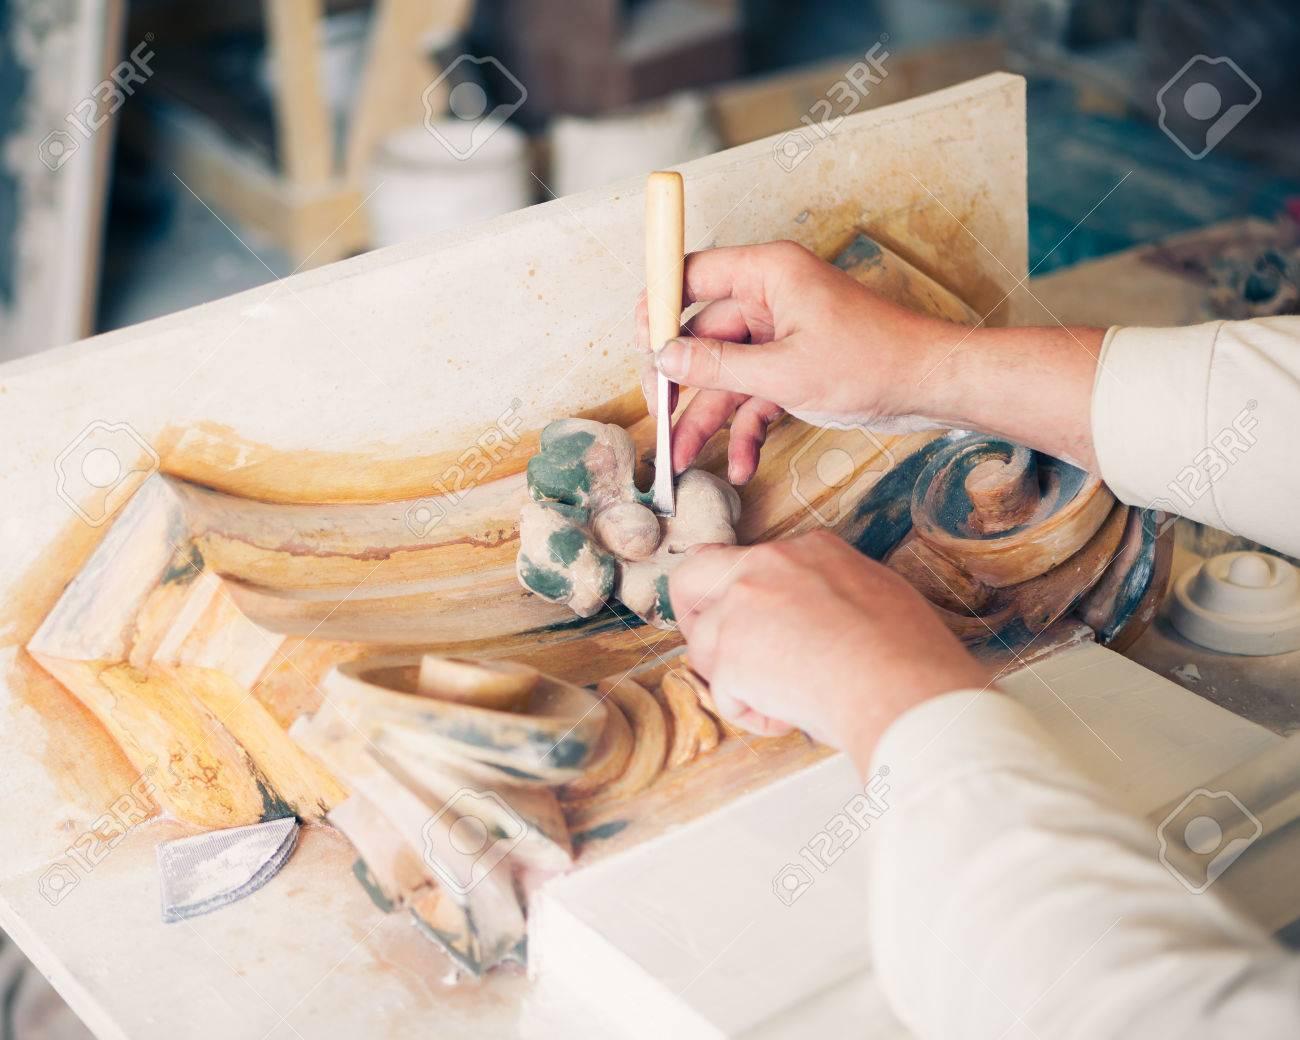 hands of restorer working with antique decor element - 42779046